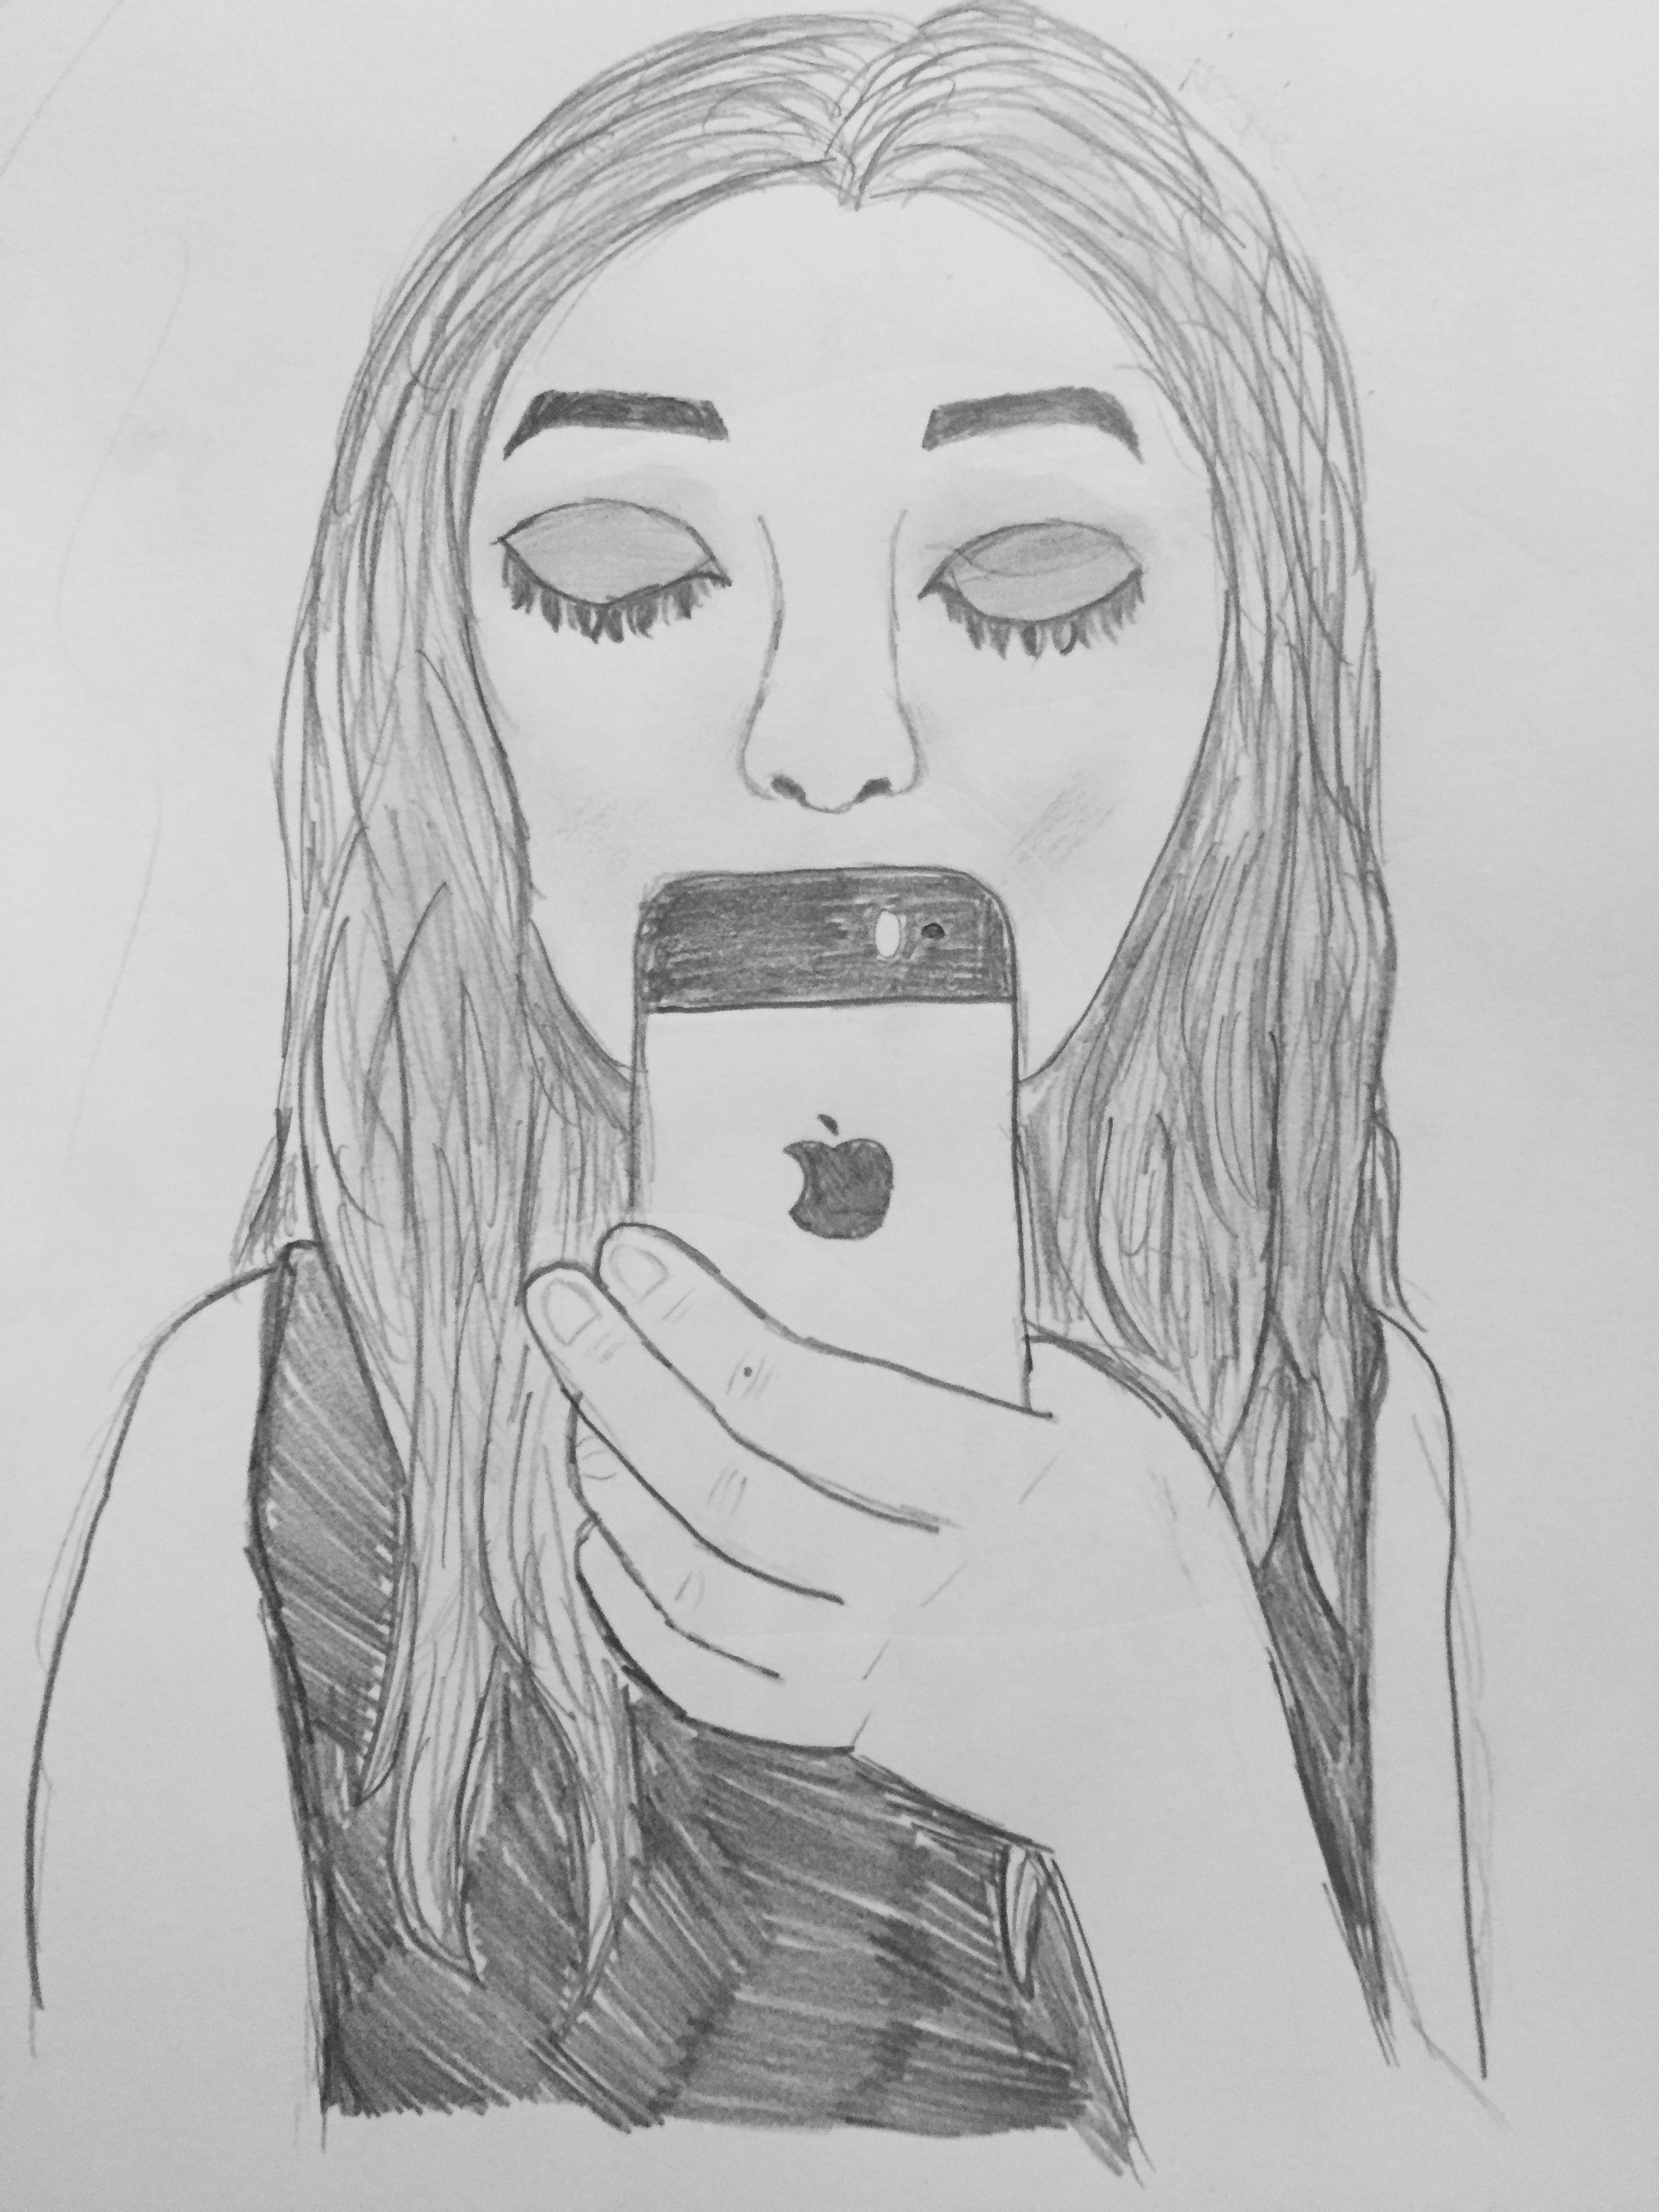 tumblr girl mirror selfie drawing art tumblr